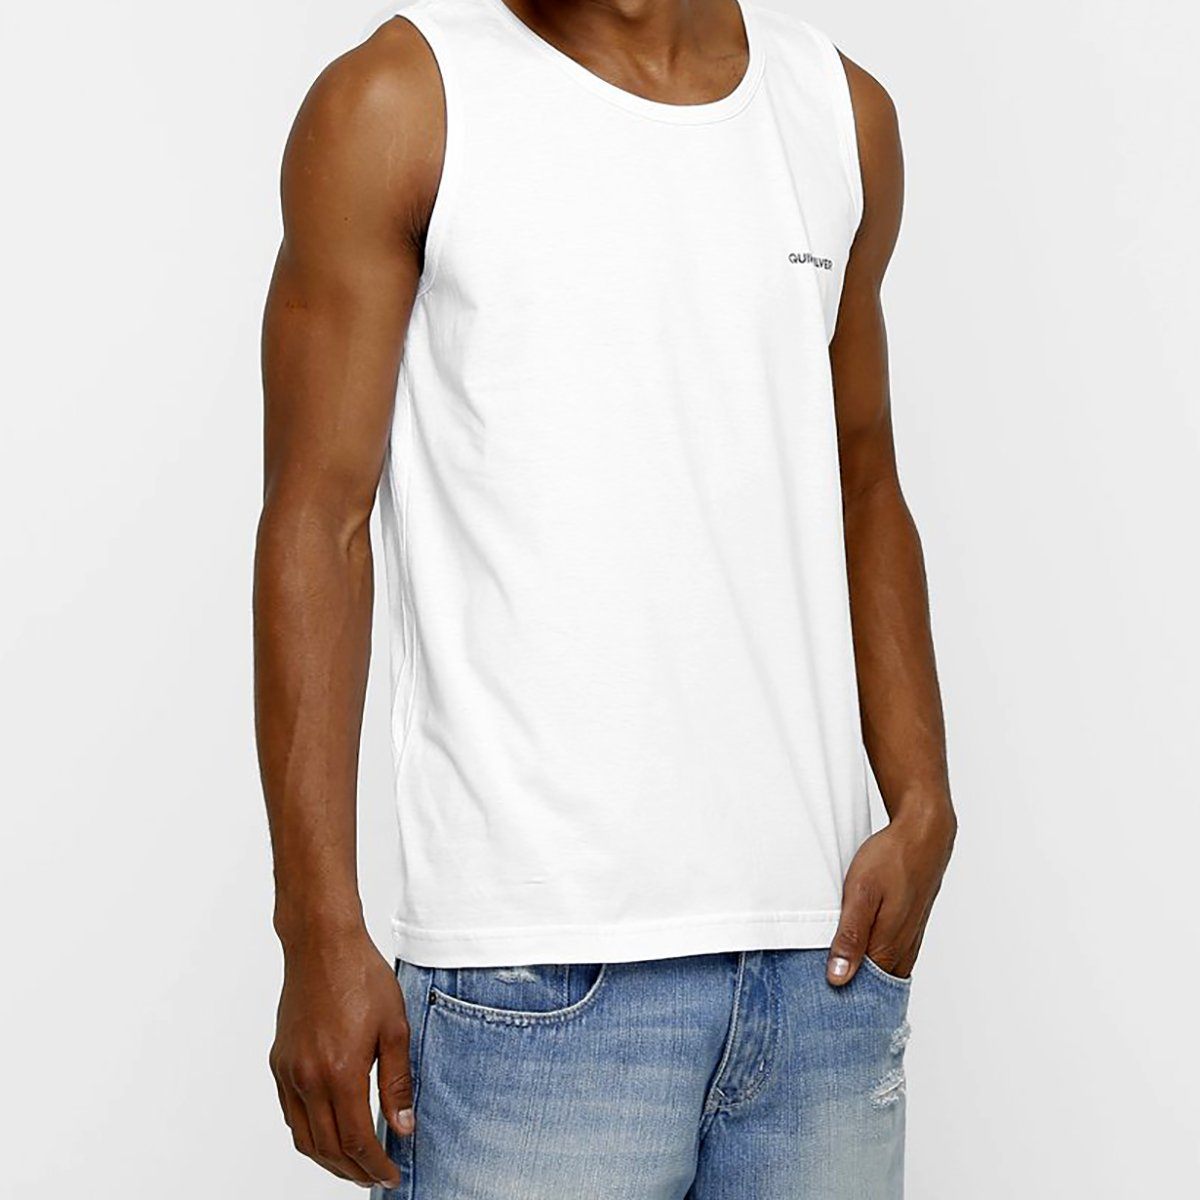 Camiseta Regata Quiksilver Fill Masculina - Branco